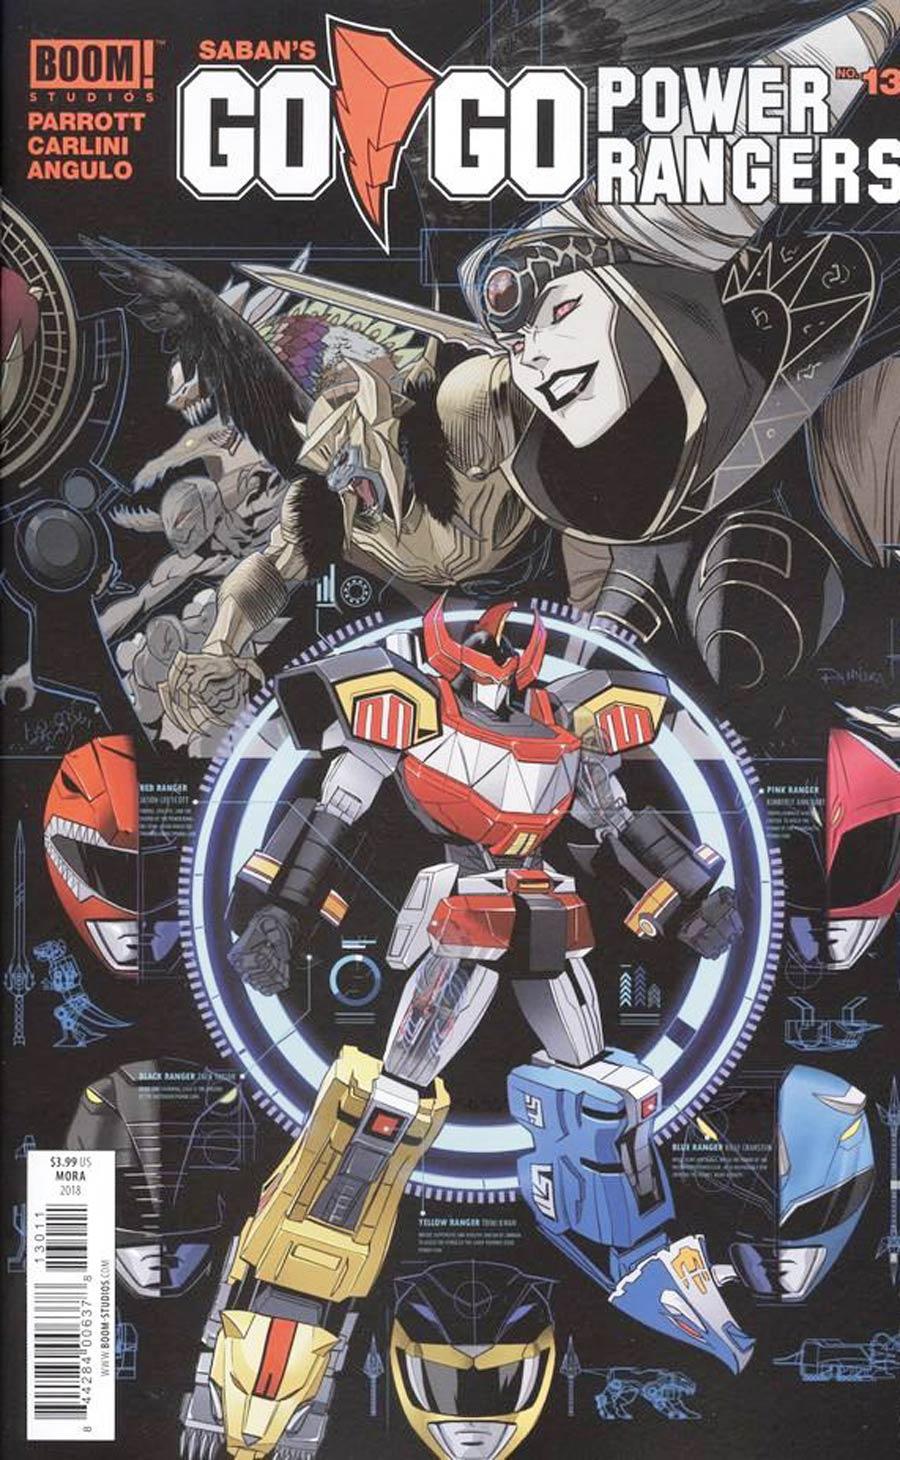 Sabans Go Go Power Rangers #13 Cover A Regular Dan Mora Cover (Shattered Grid Epilogue)